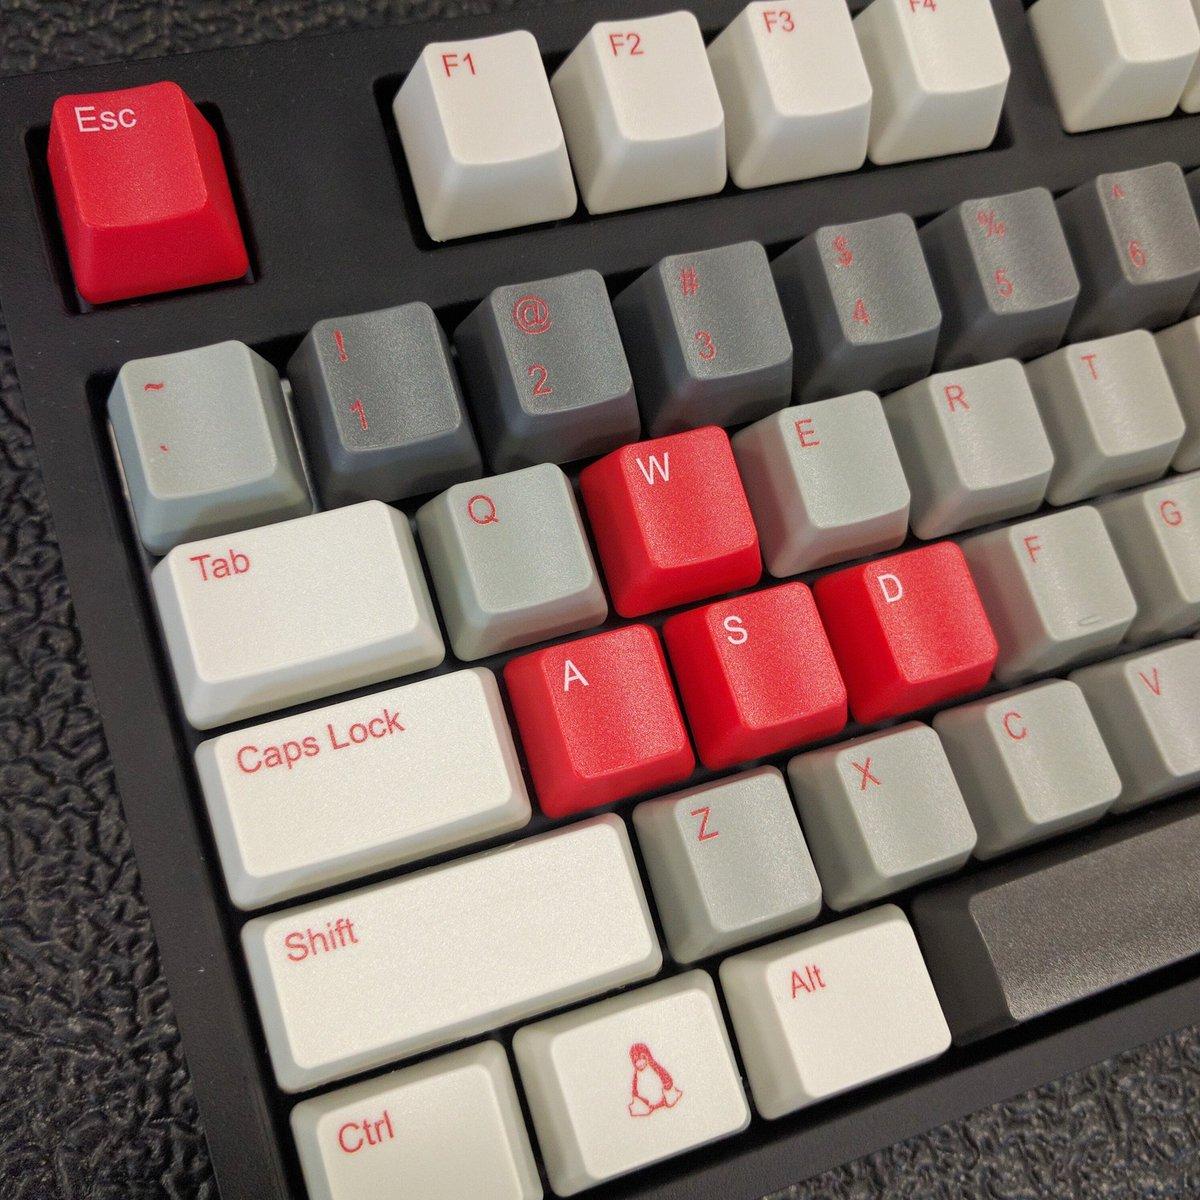 WASD Keyboards On Twitter Modern Linux With Custom Print